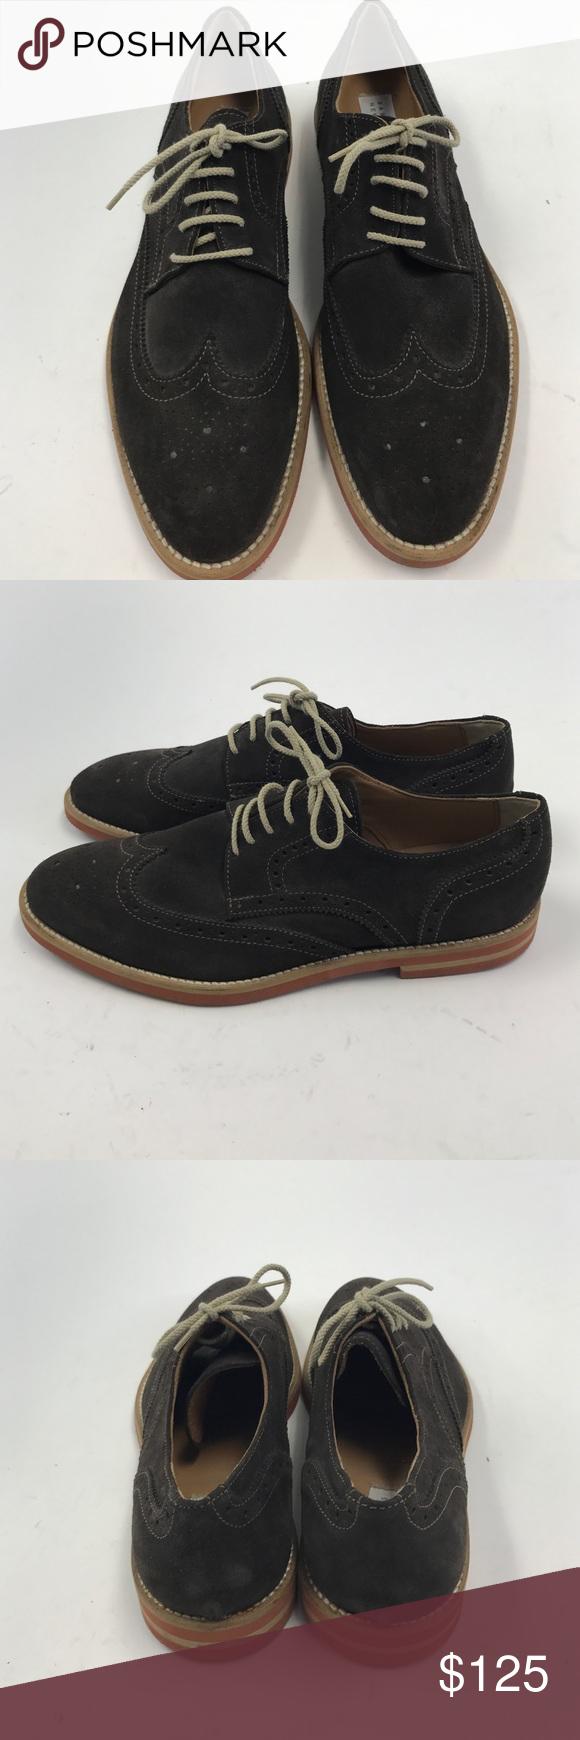 Barney's NewYork Brown Suede Oxford Sz 9M Brand spankin new Barneys New York Shoes Oxfords & Derbys